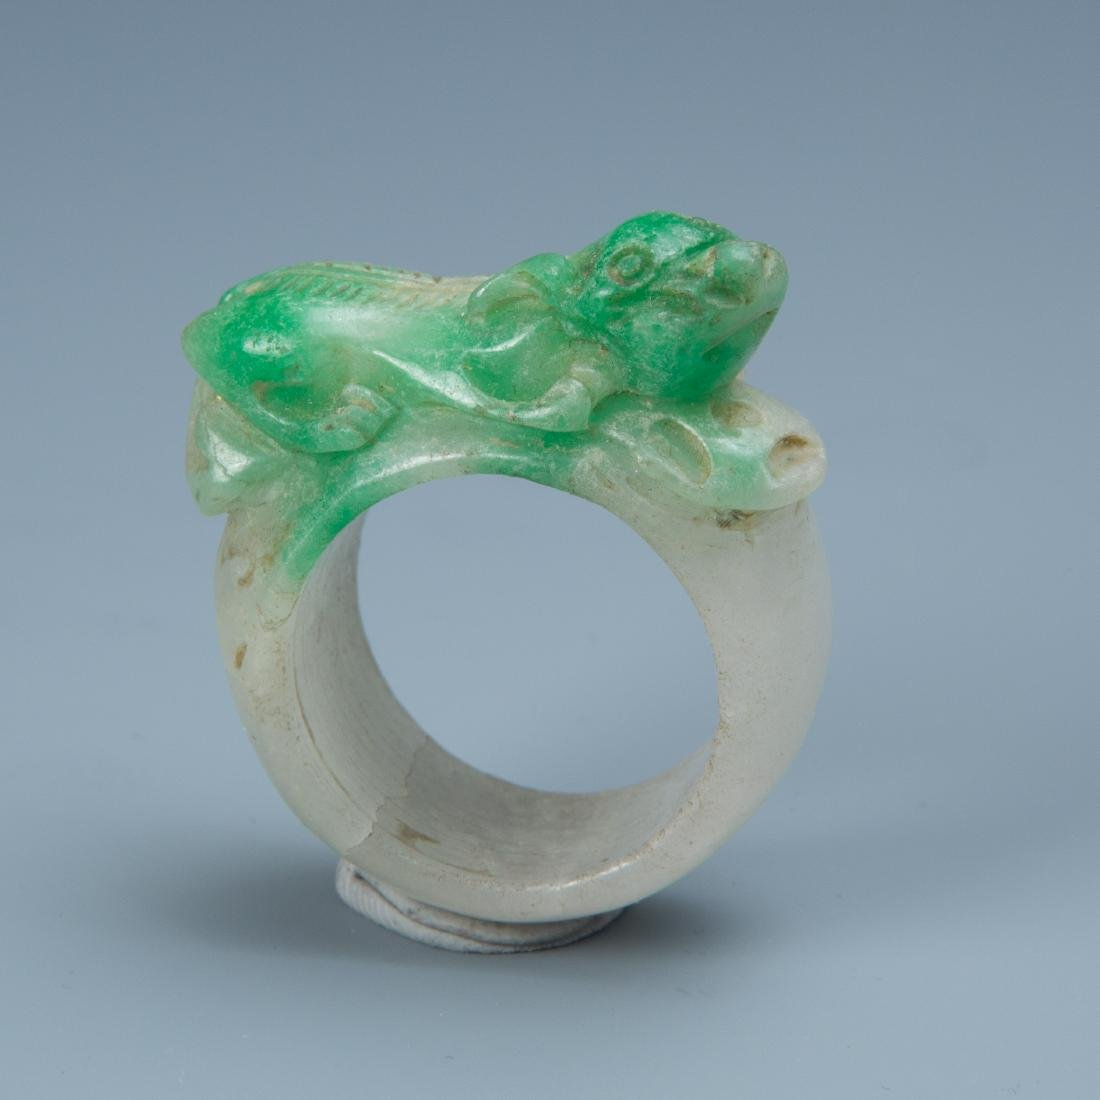 Estate Sale: 3pc Carved Jade Ring, Snuff Bottle & Swine - 2